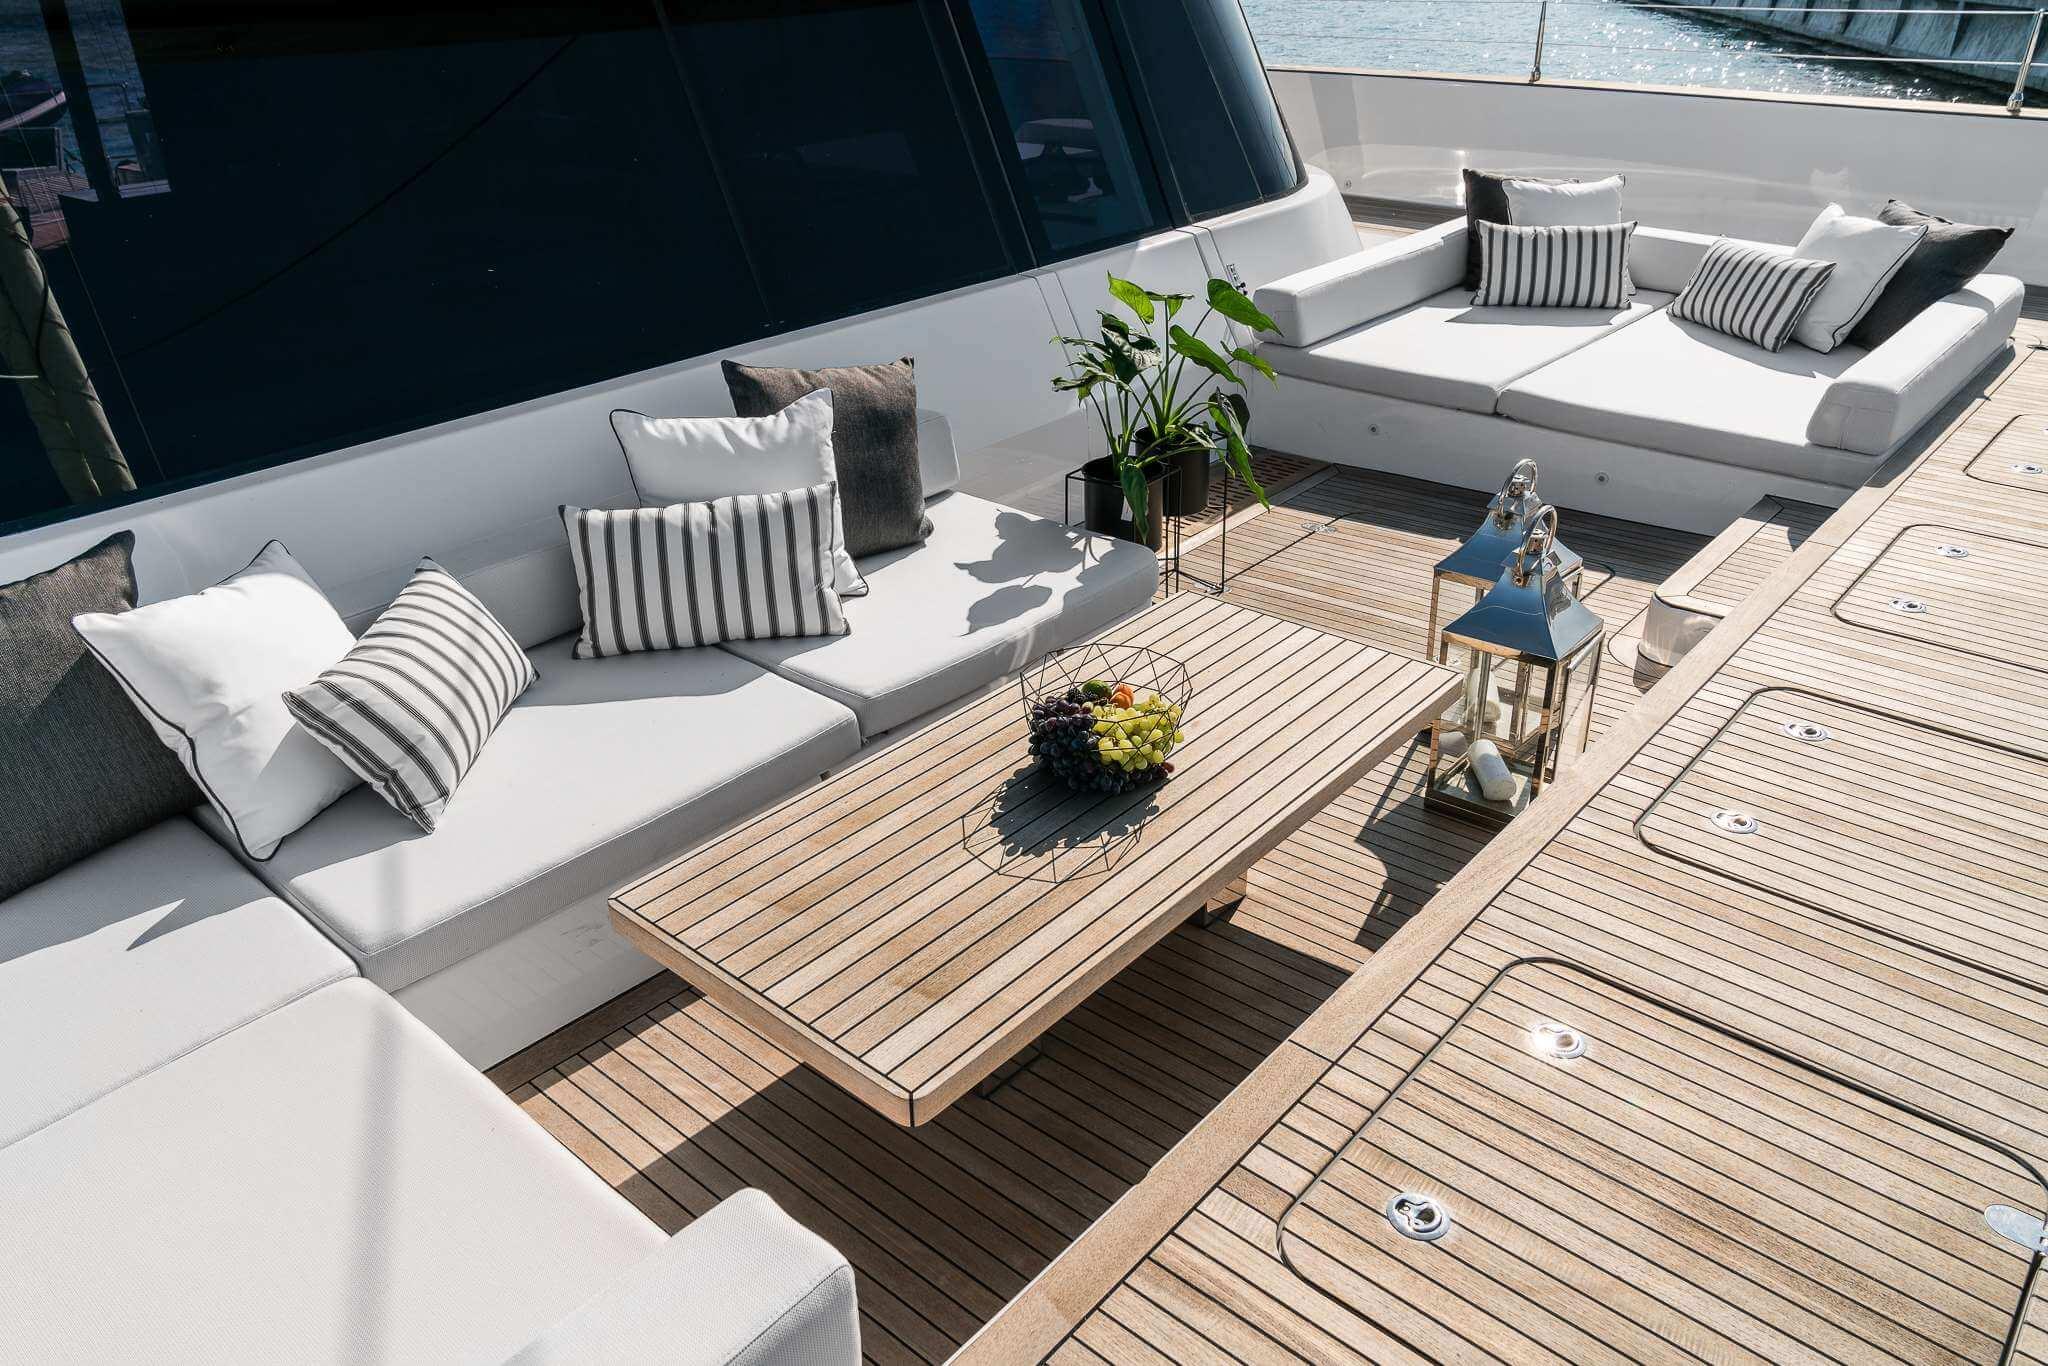 Genny Sunreef Catamaran 9